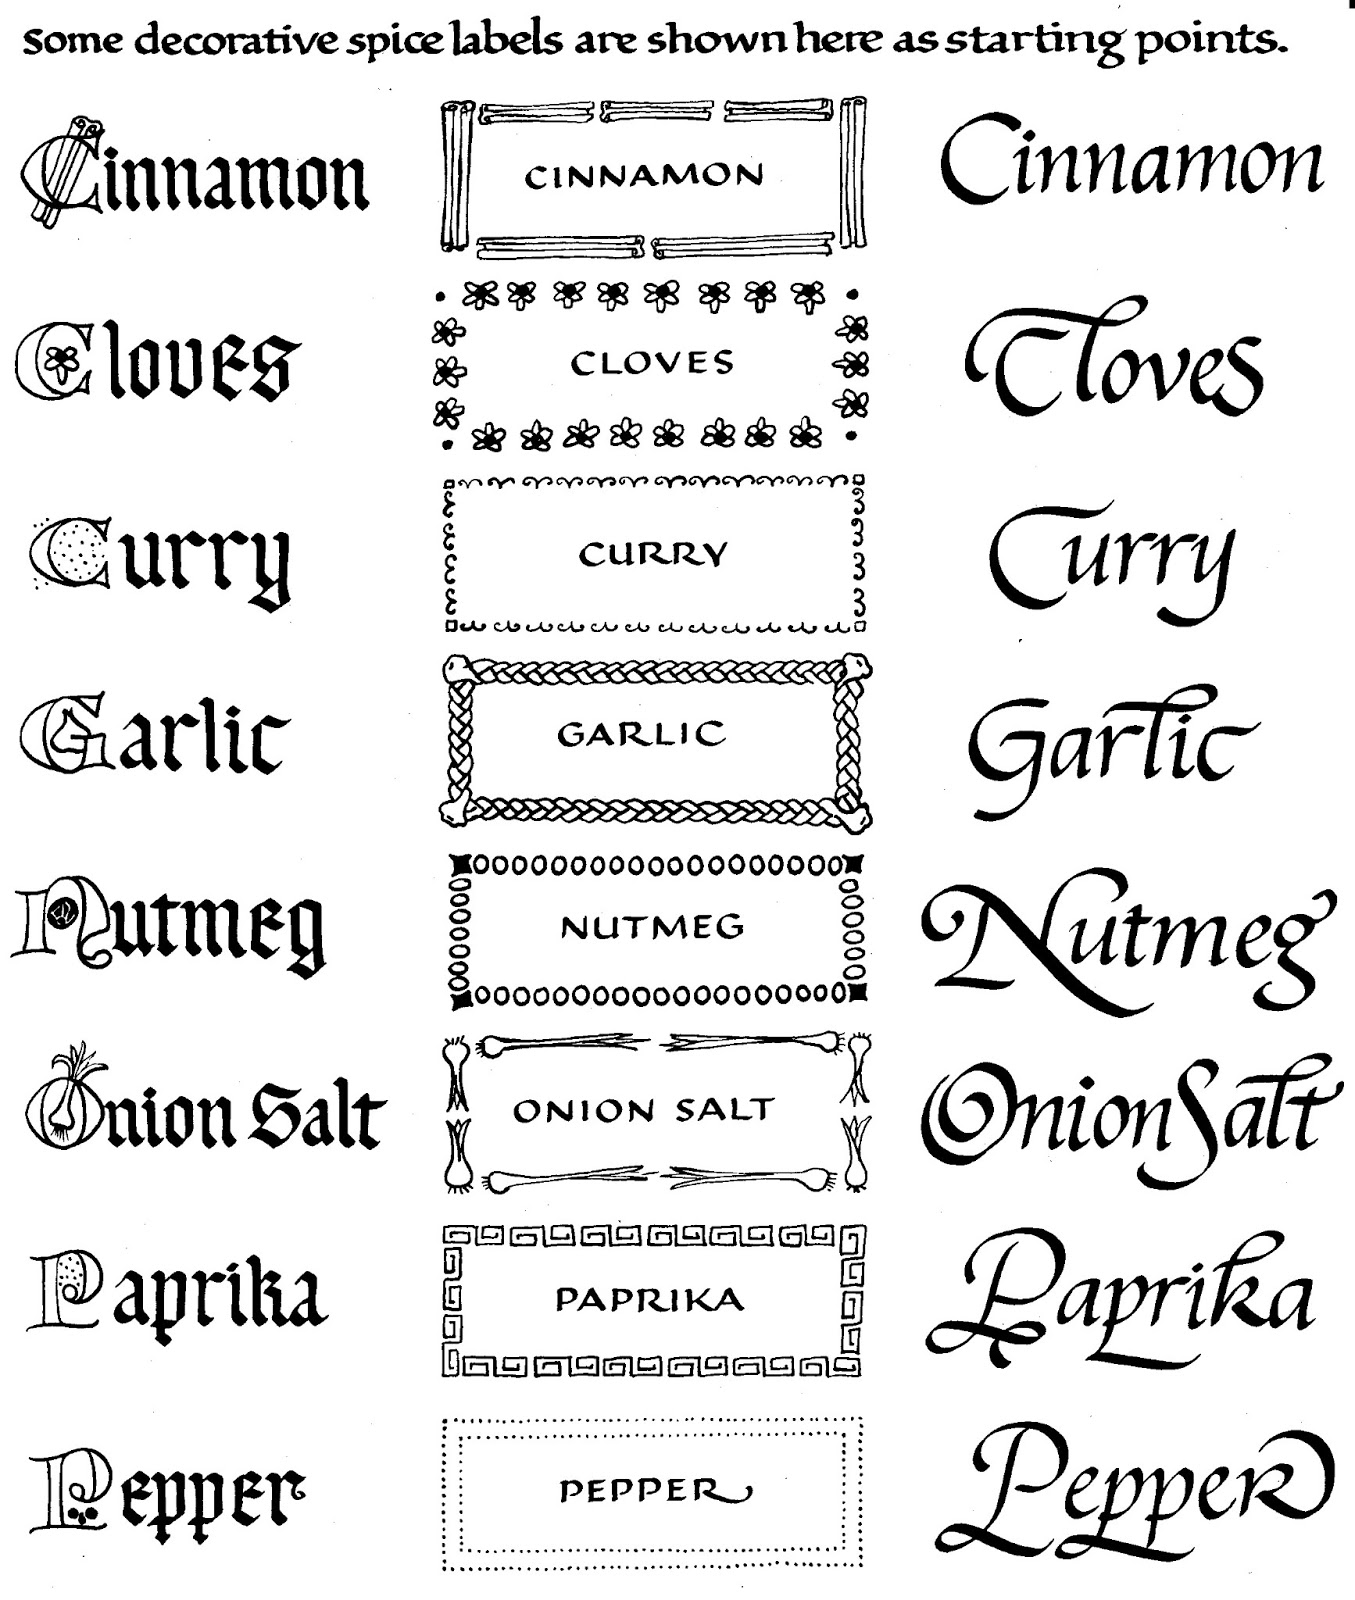 margaret shepherd calligraphy blog labels